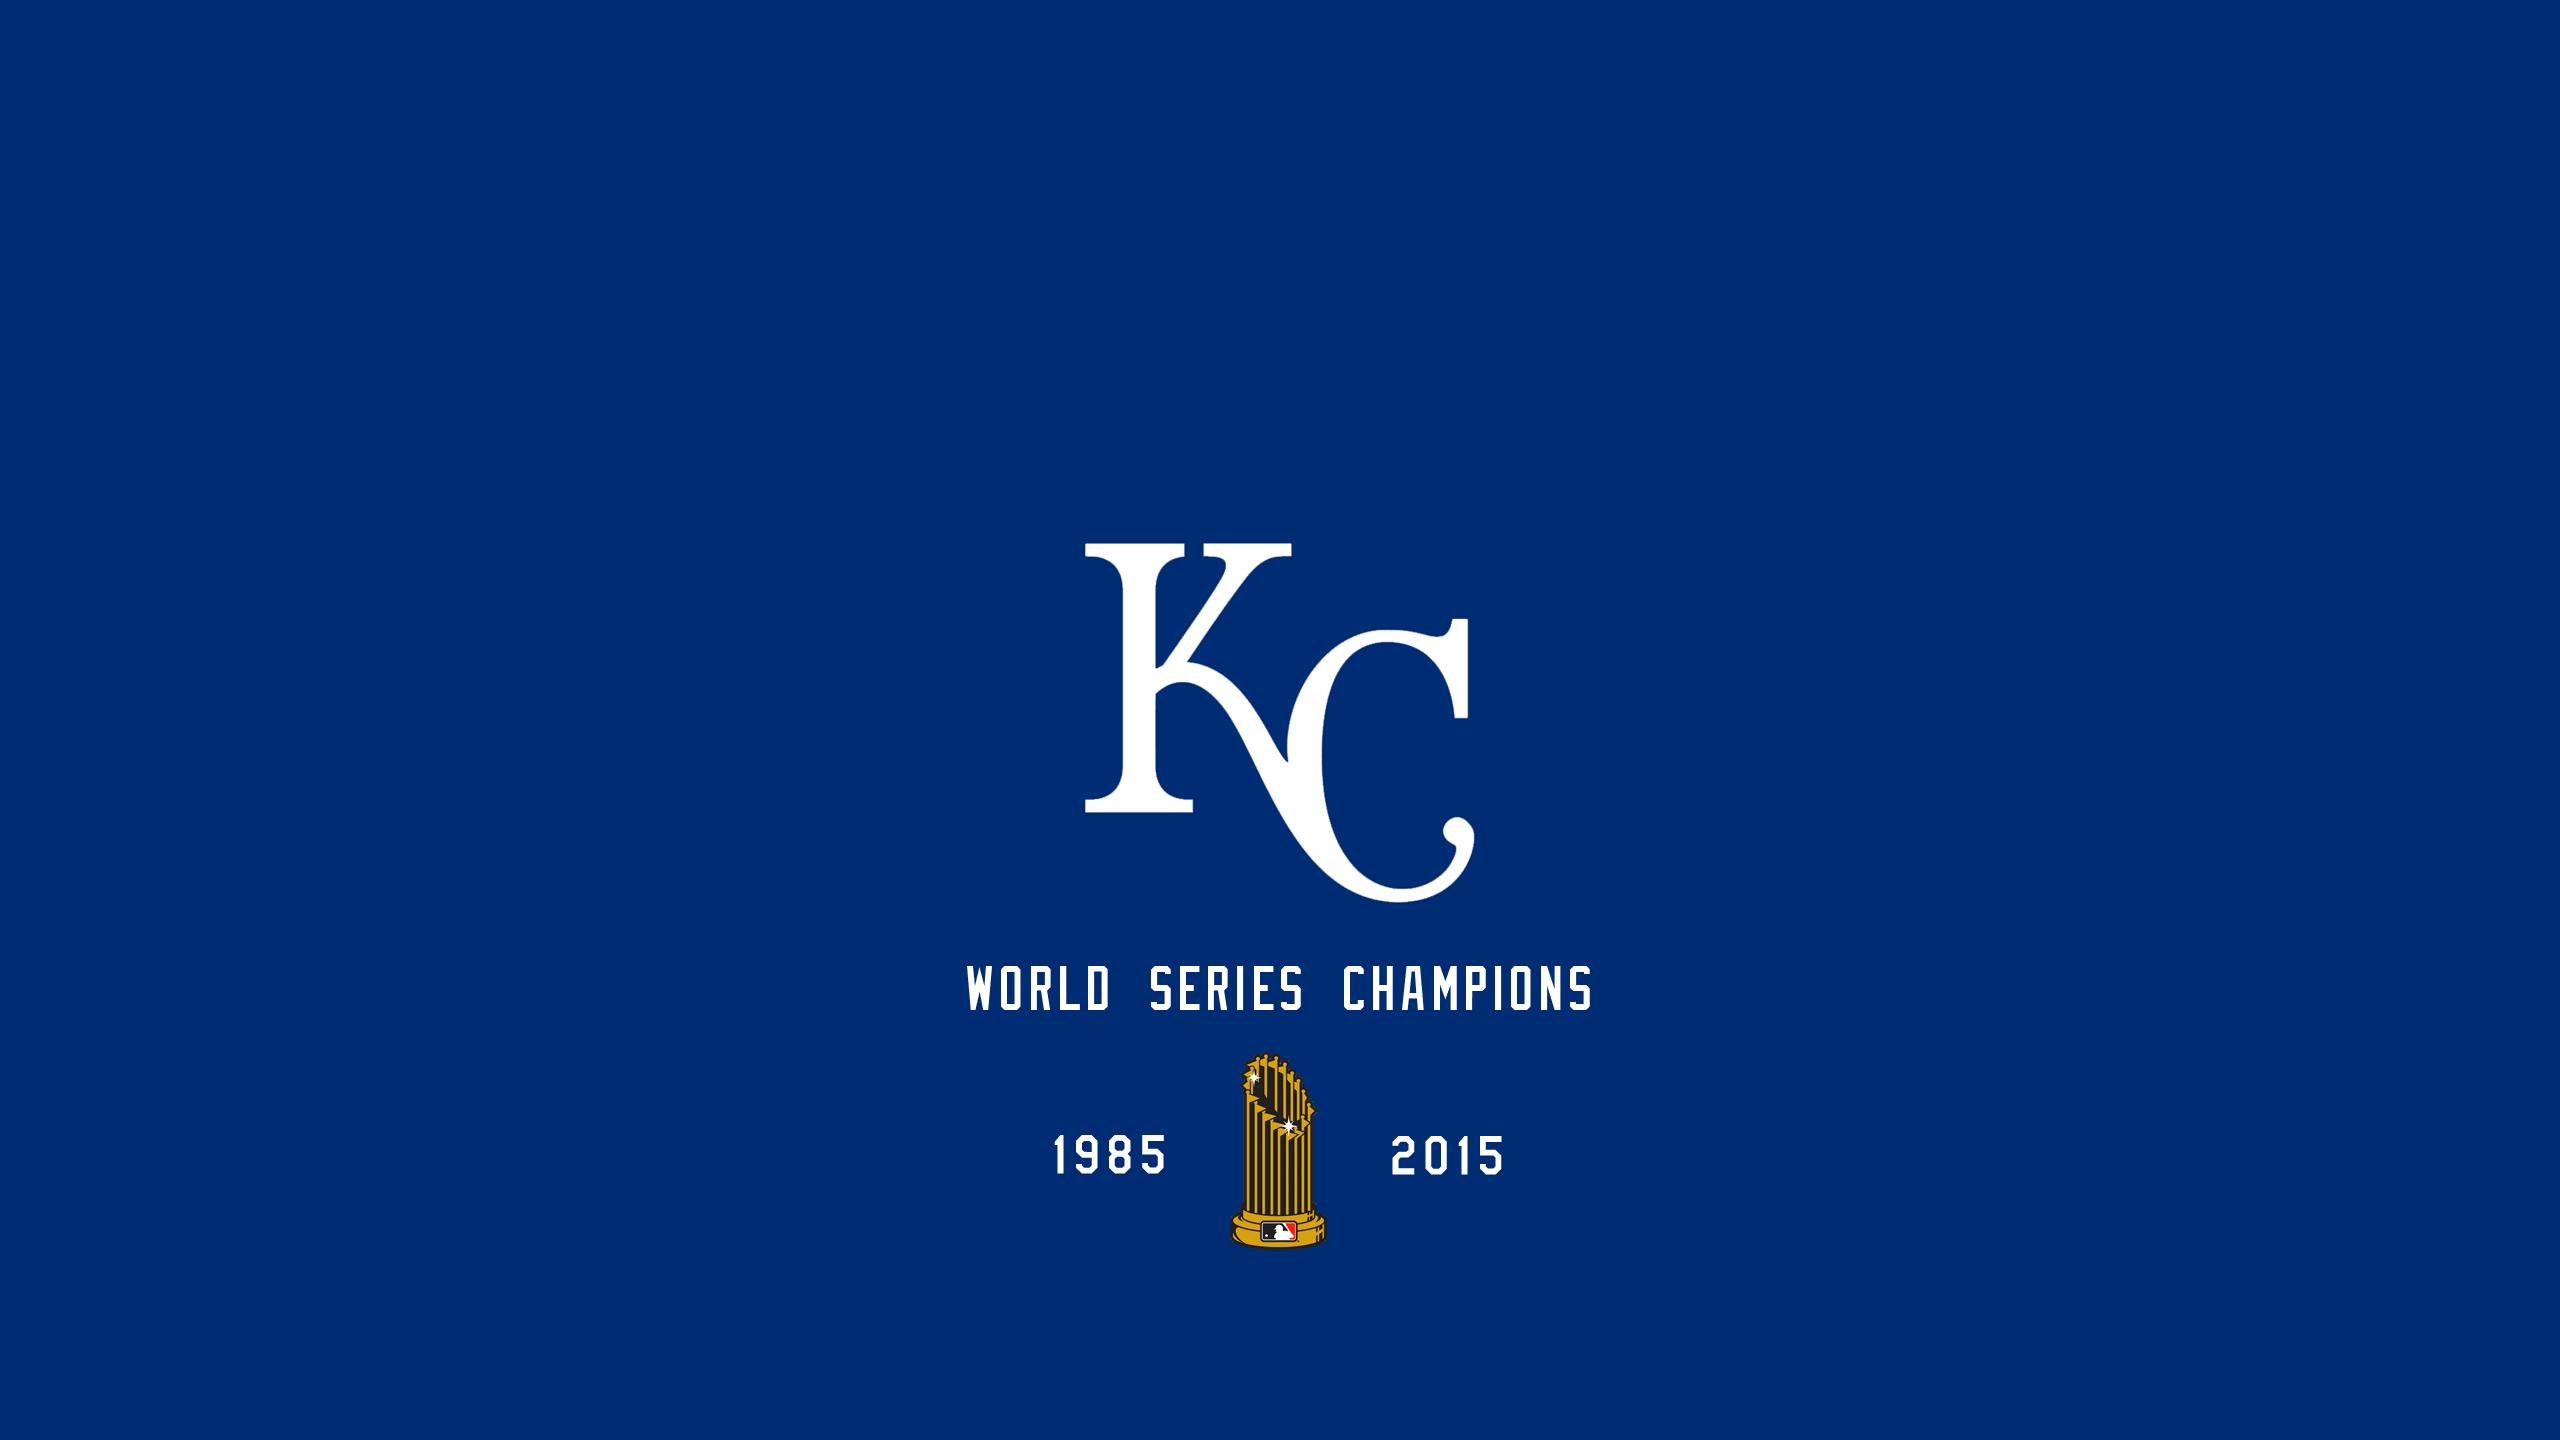 Kansas City Royals - World Series Champs